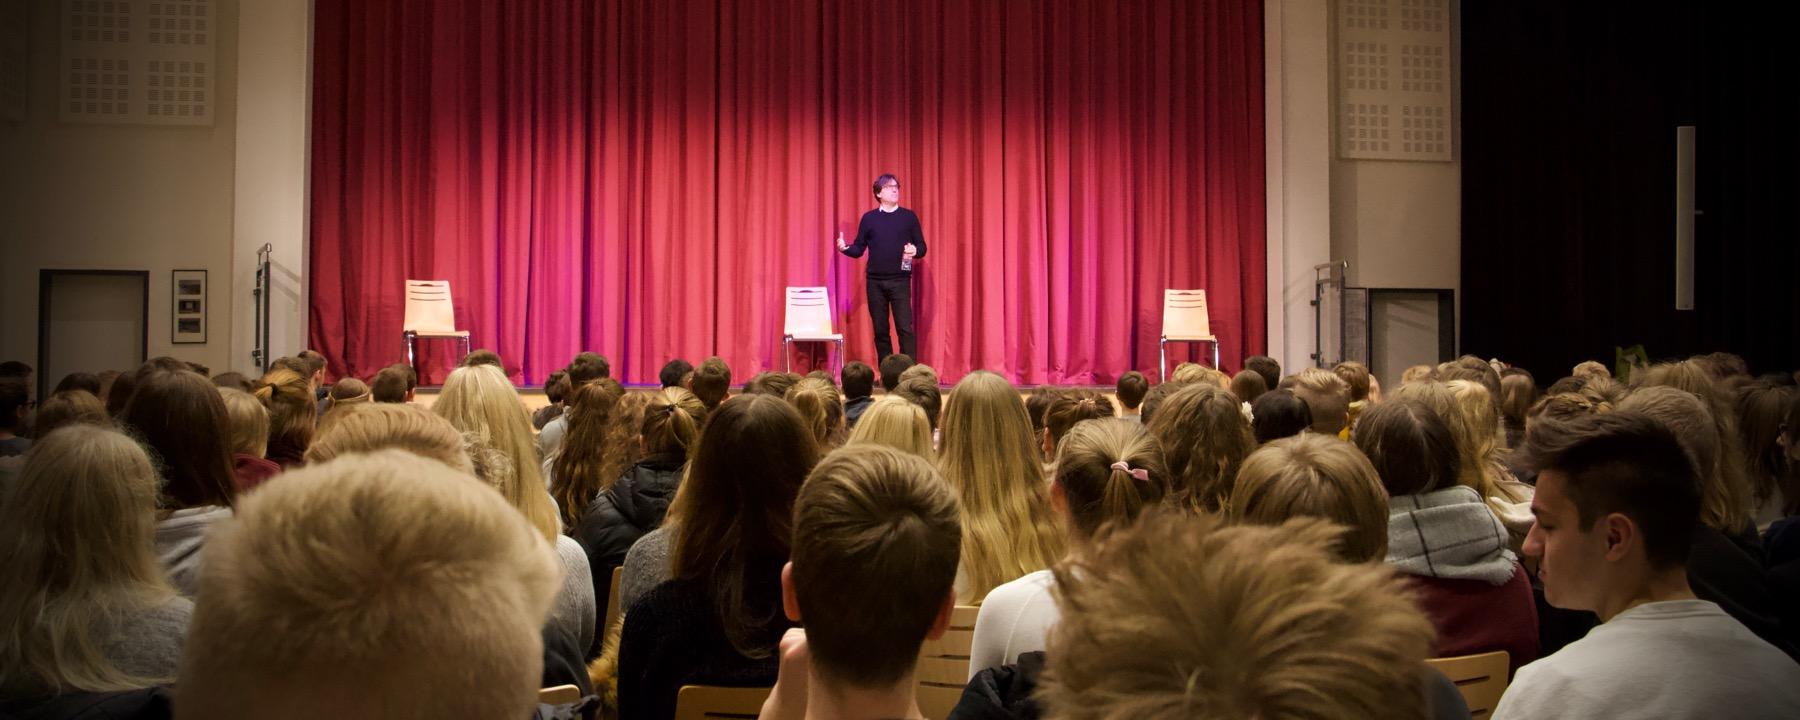 Rasendes Publikum Bei Shakespeare Und Spottiswoode